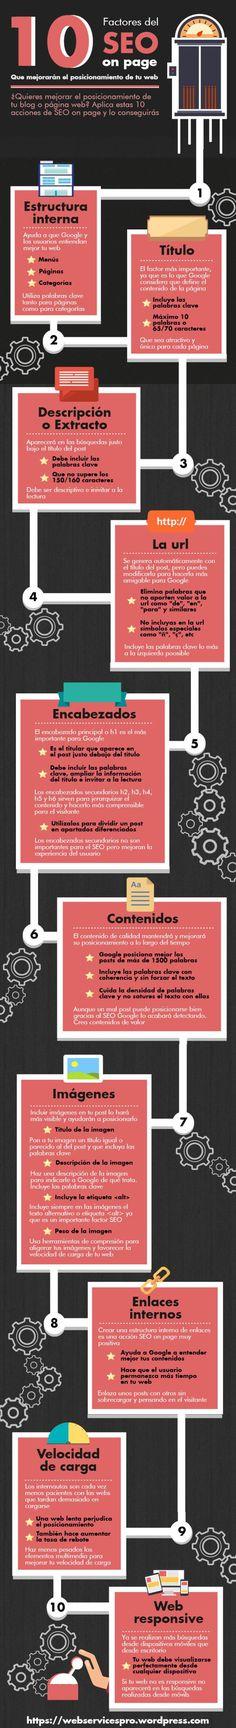 10 factores del SEO onpage #infografia